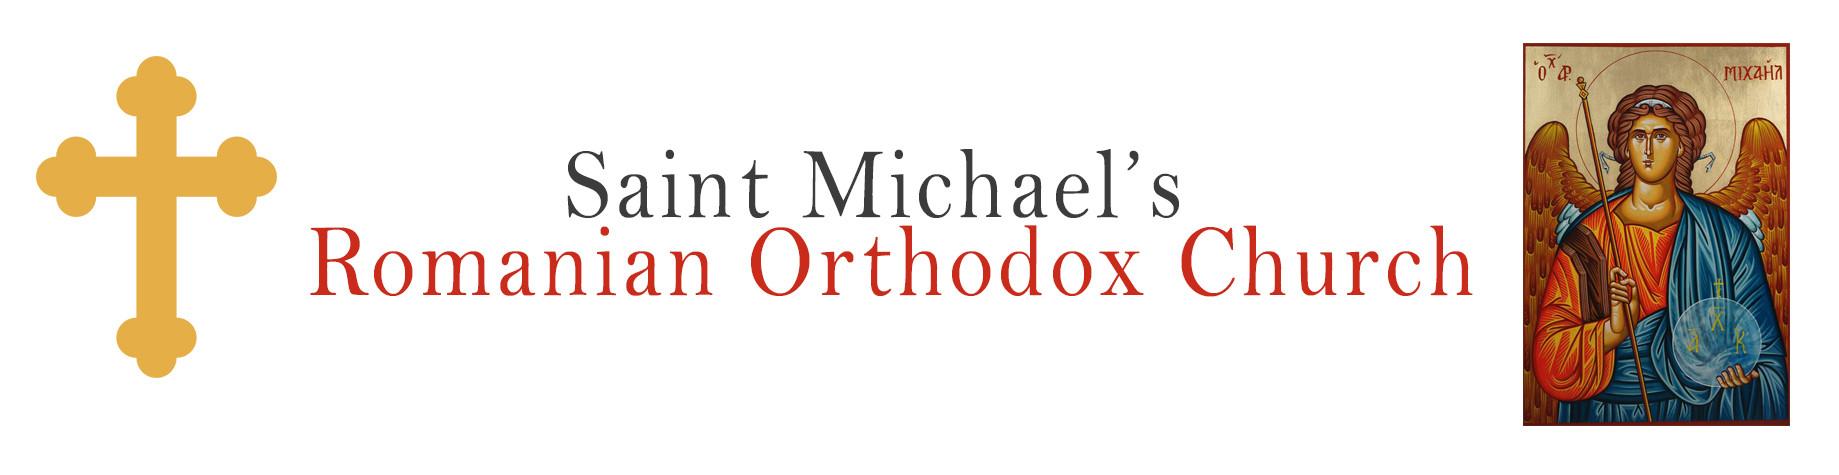 Confession | Saint Michael's Romanian Orthodox Church